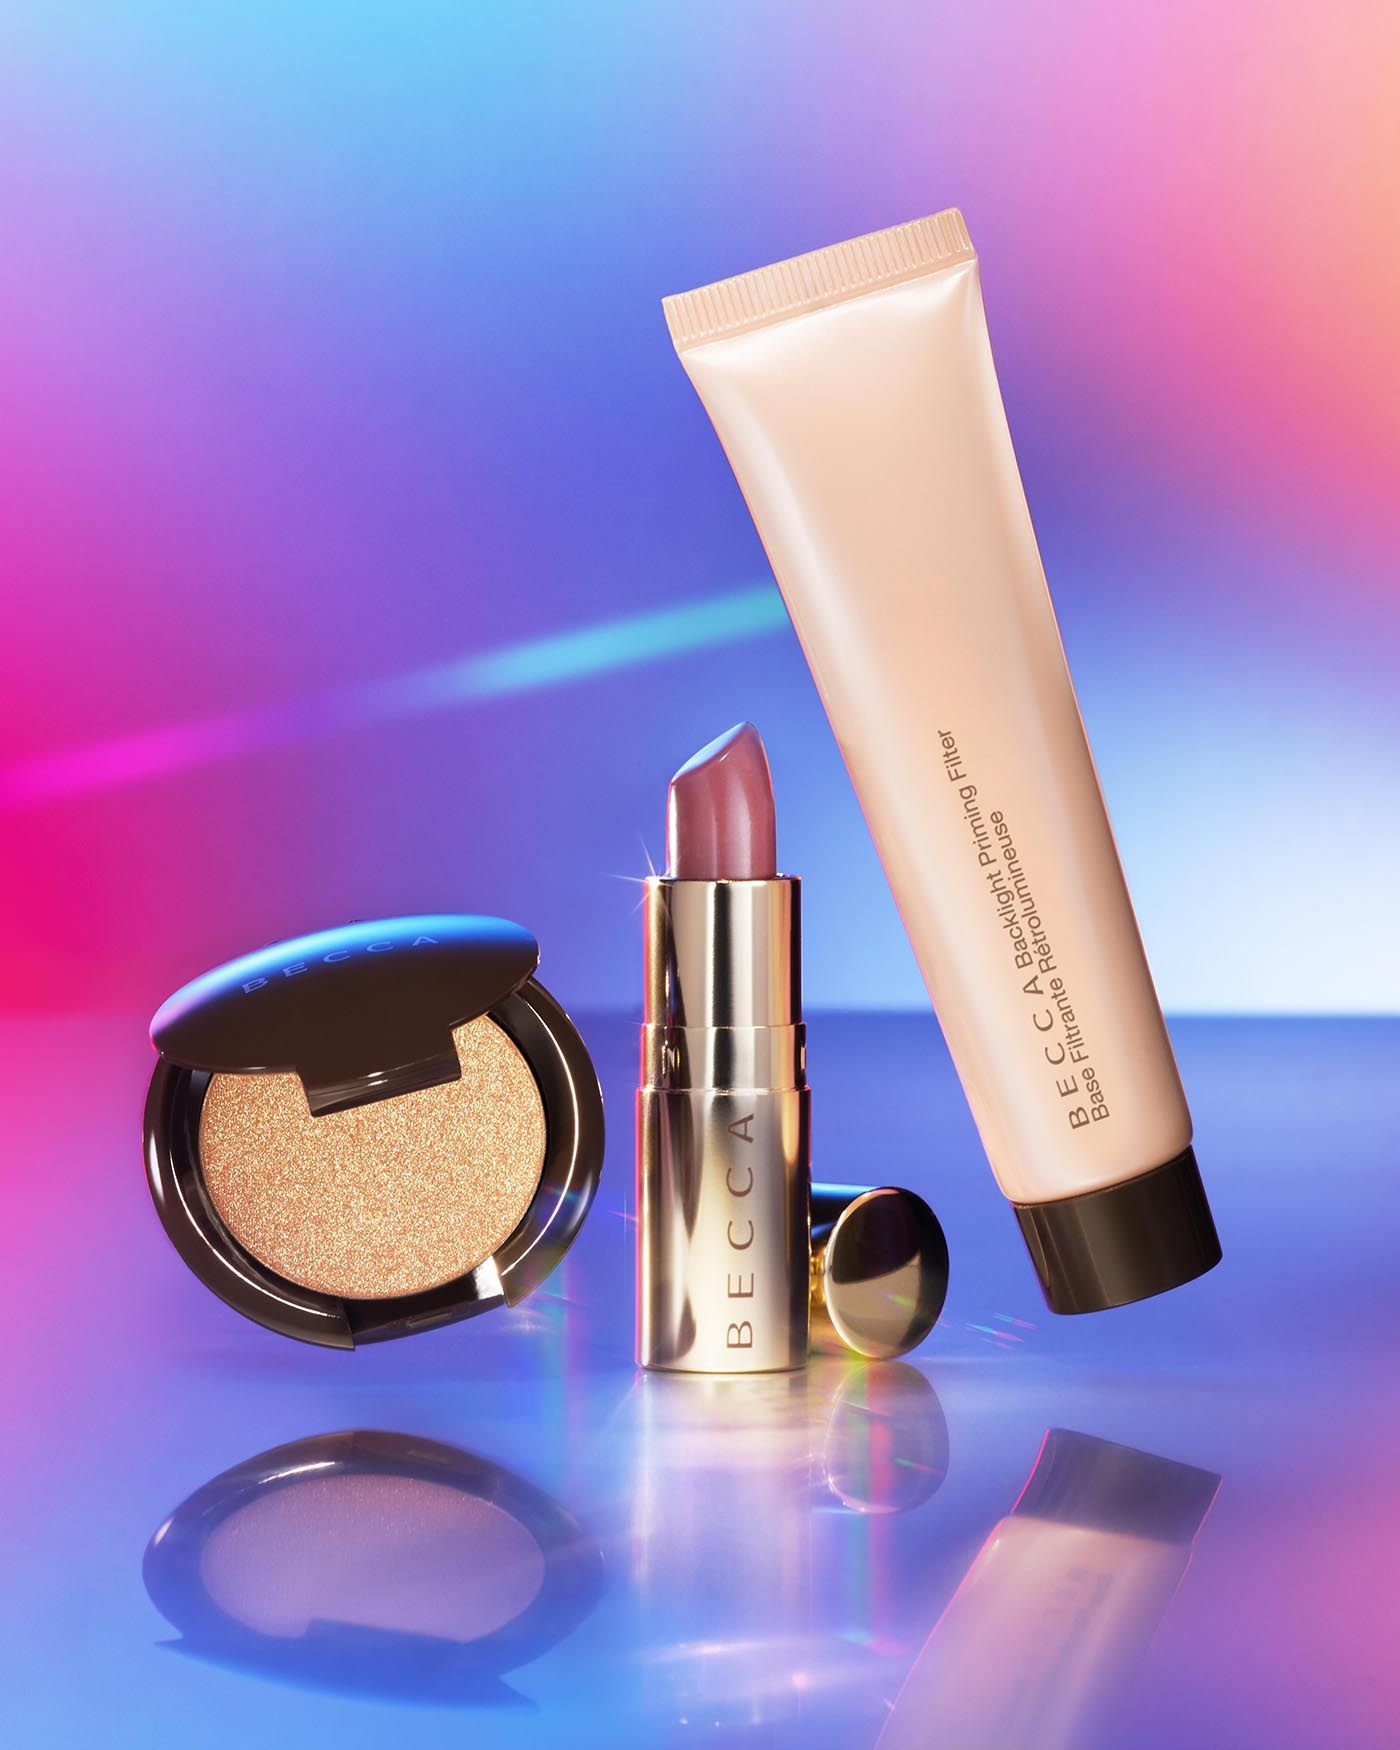 Primer, Highlighter & Lip Kit Becca cosmetics, Glow kit